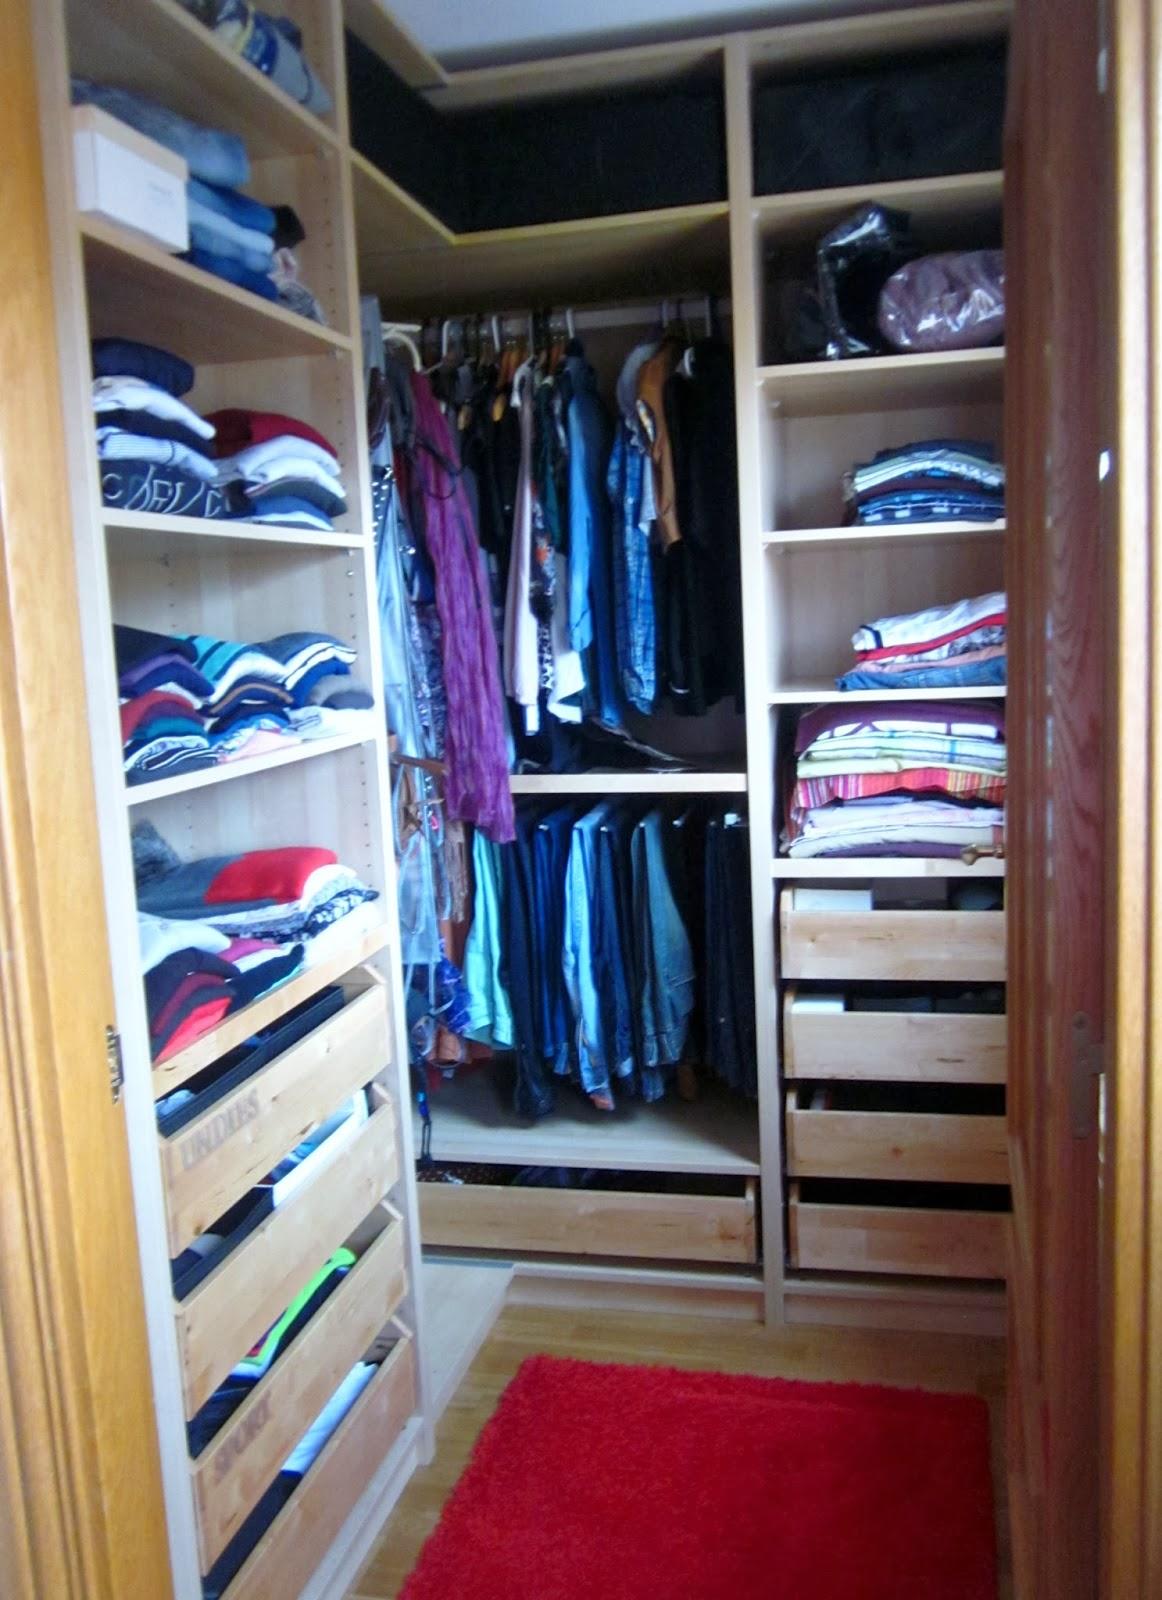 I d e a consejos y trucos para ordenar un armario - Ordenar armarios ropa ...